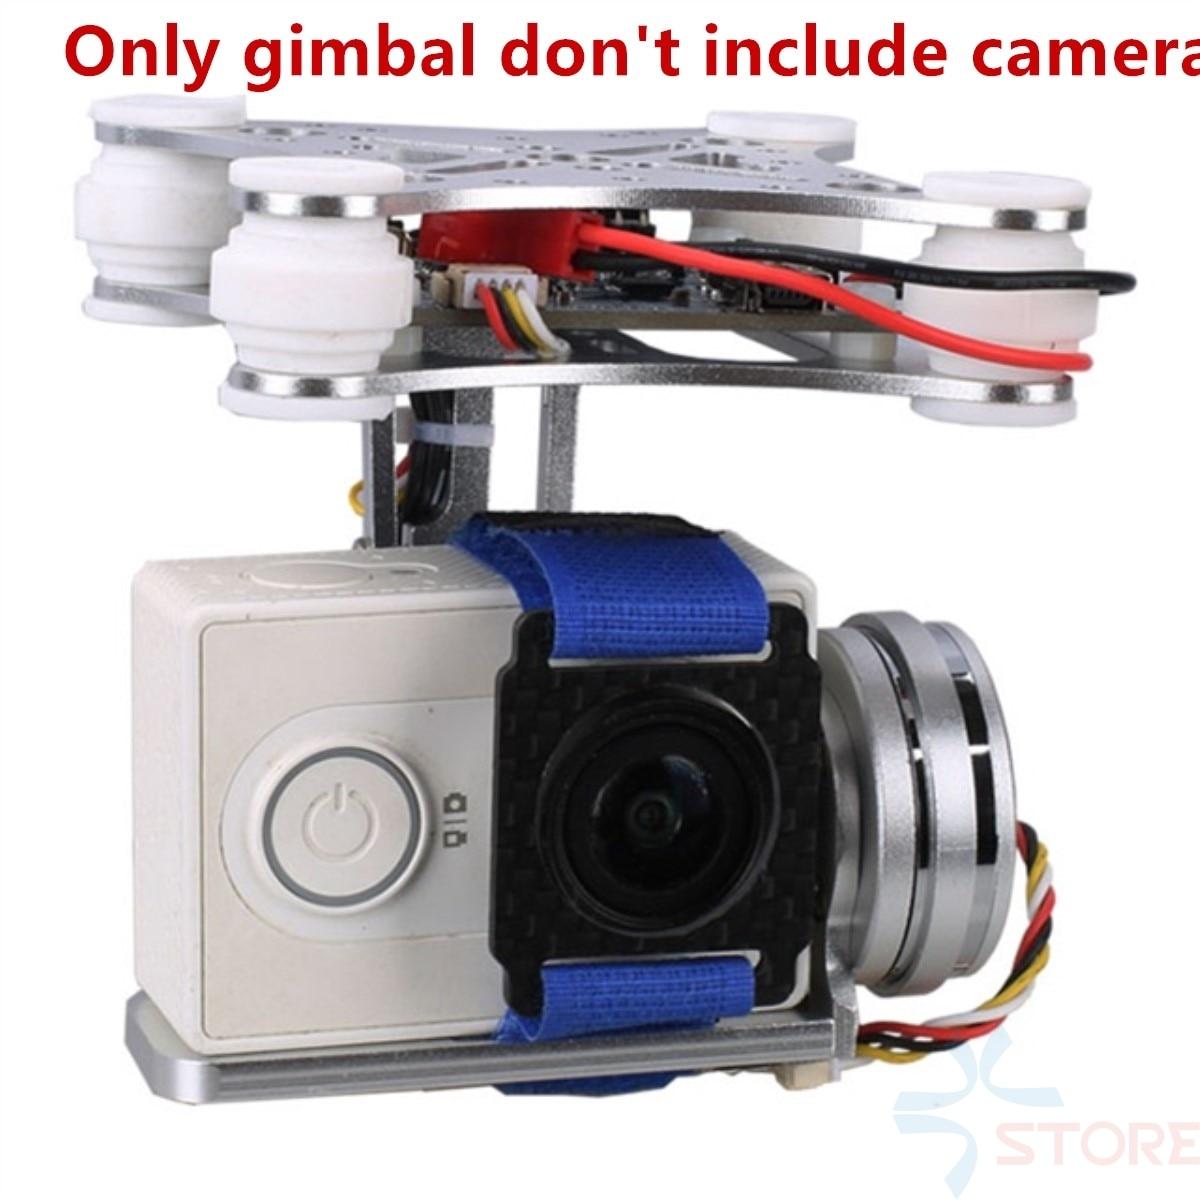 2 aixs 2D бесщеточный Камера Gimbal для GoPro SJCAM Xiaomi Yi Action Камера Экен F450 F550 S500 FPV Drone multirotor квадрокоптер